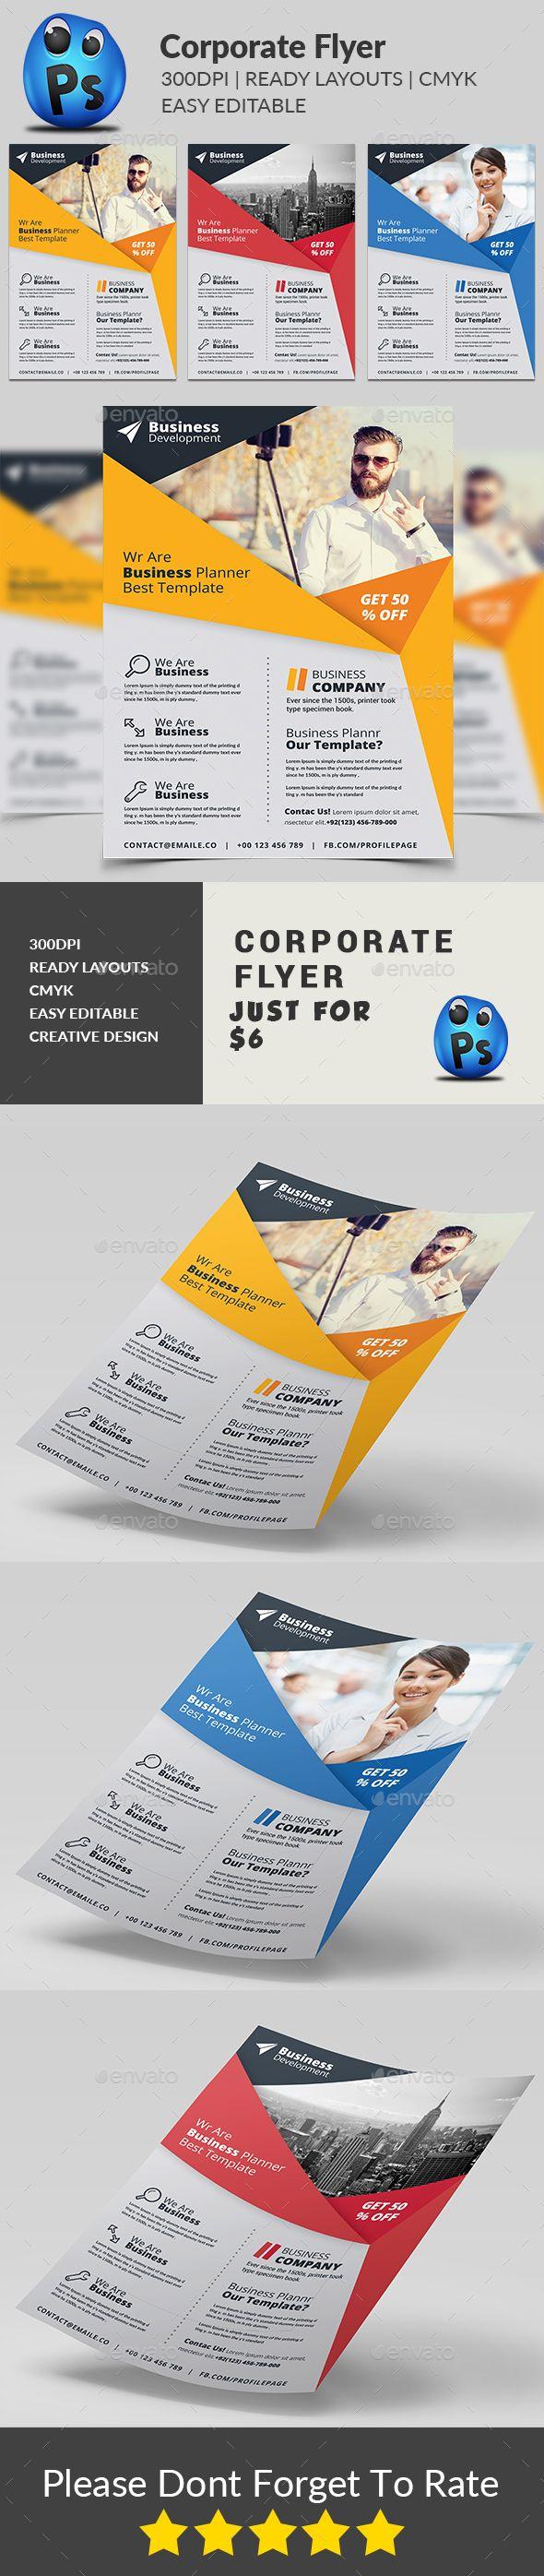 9 best идеи за дизайн images on Pinterest | Brochures, Business ...